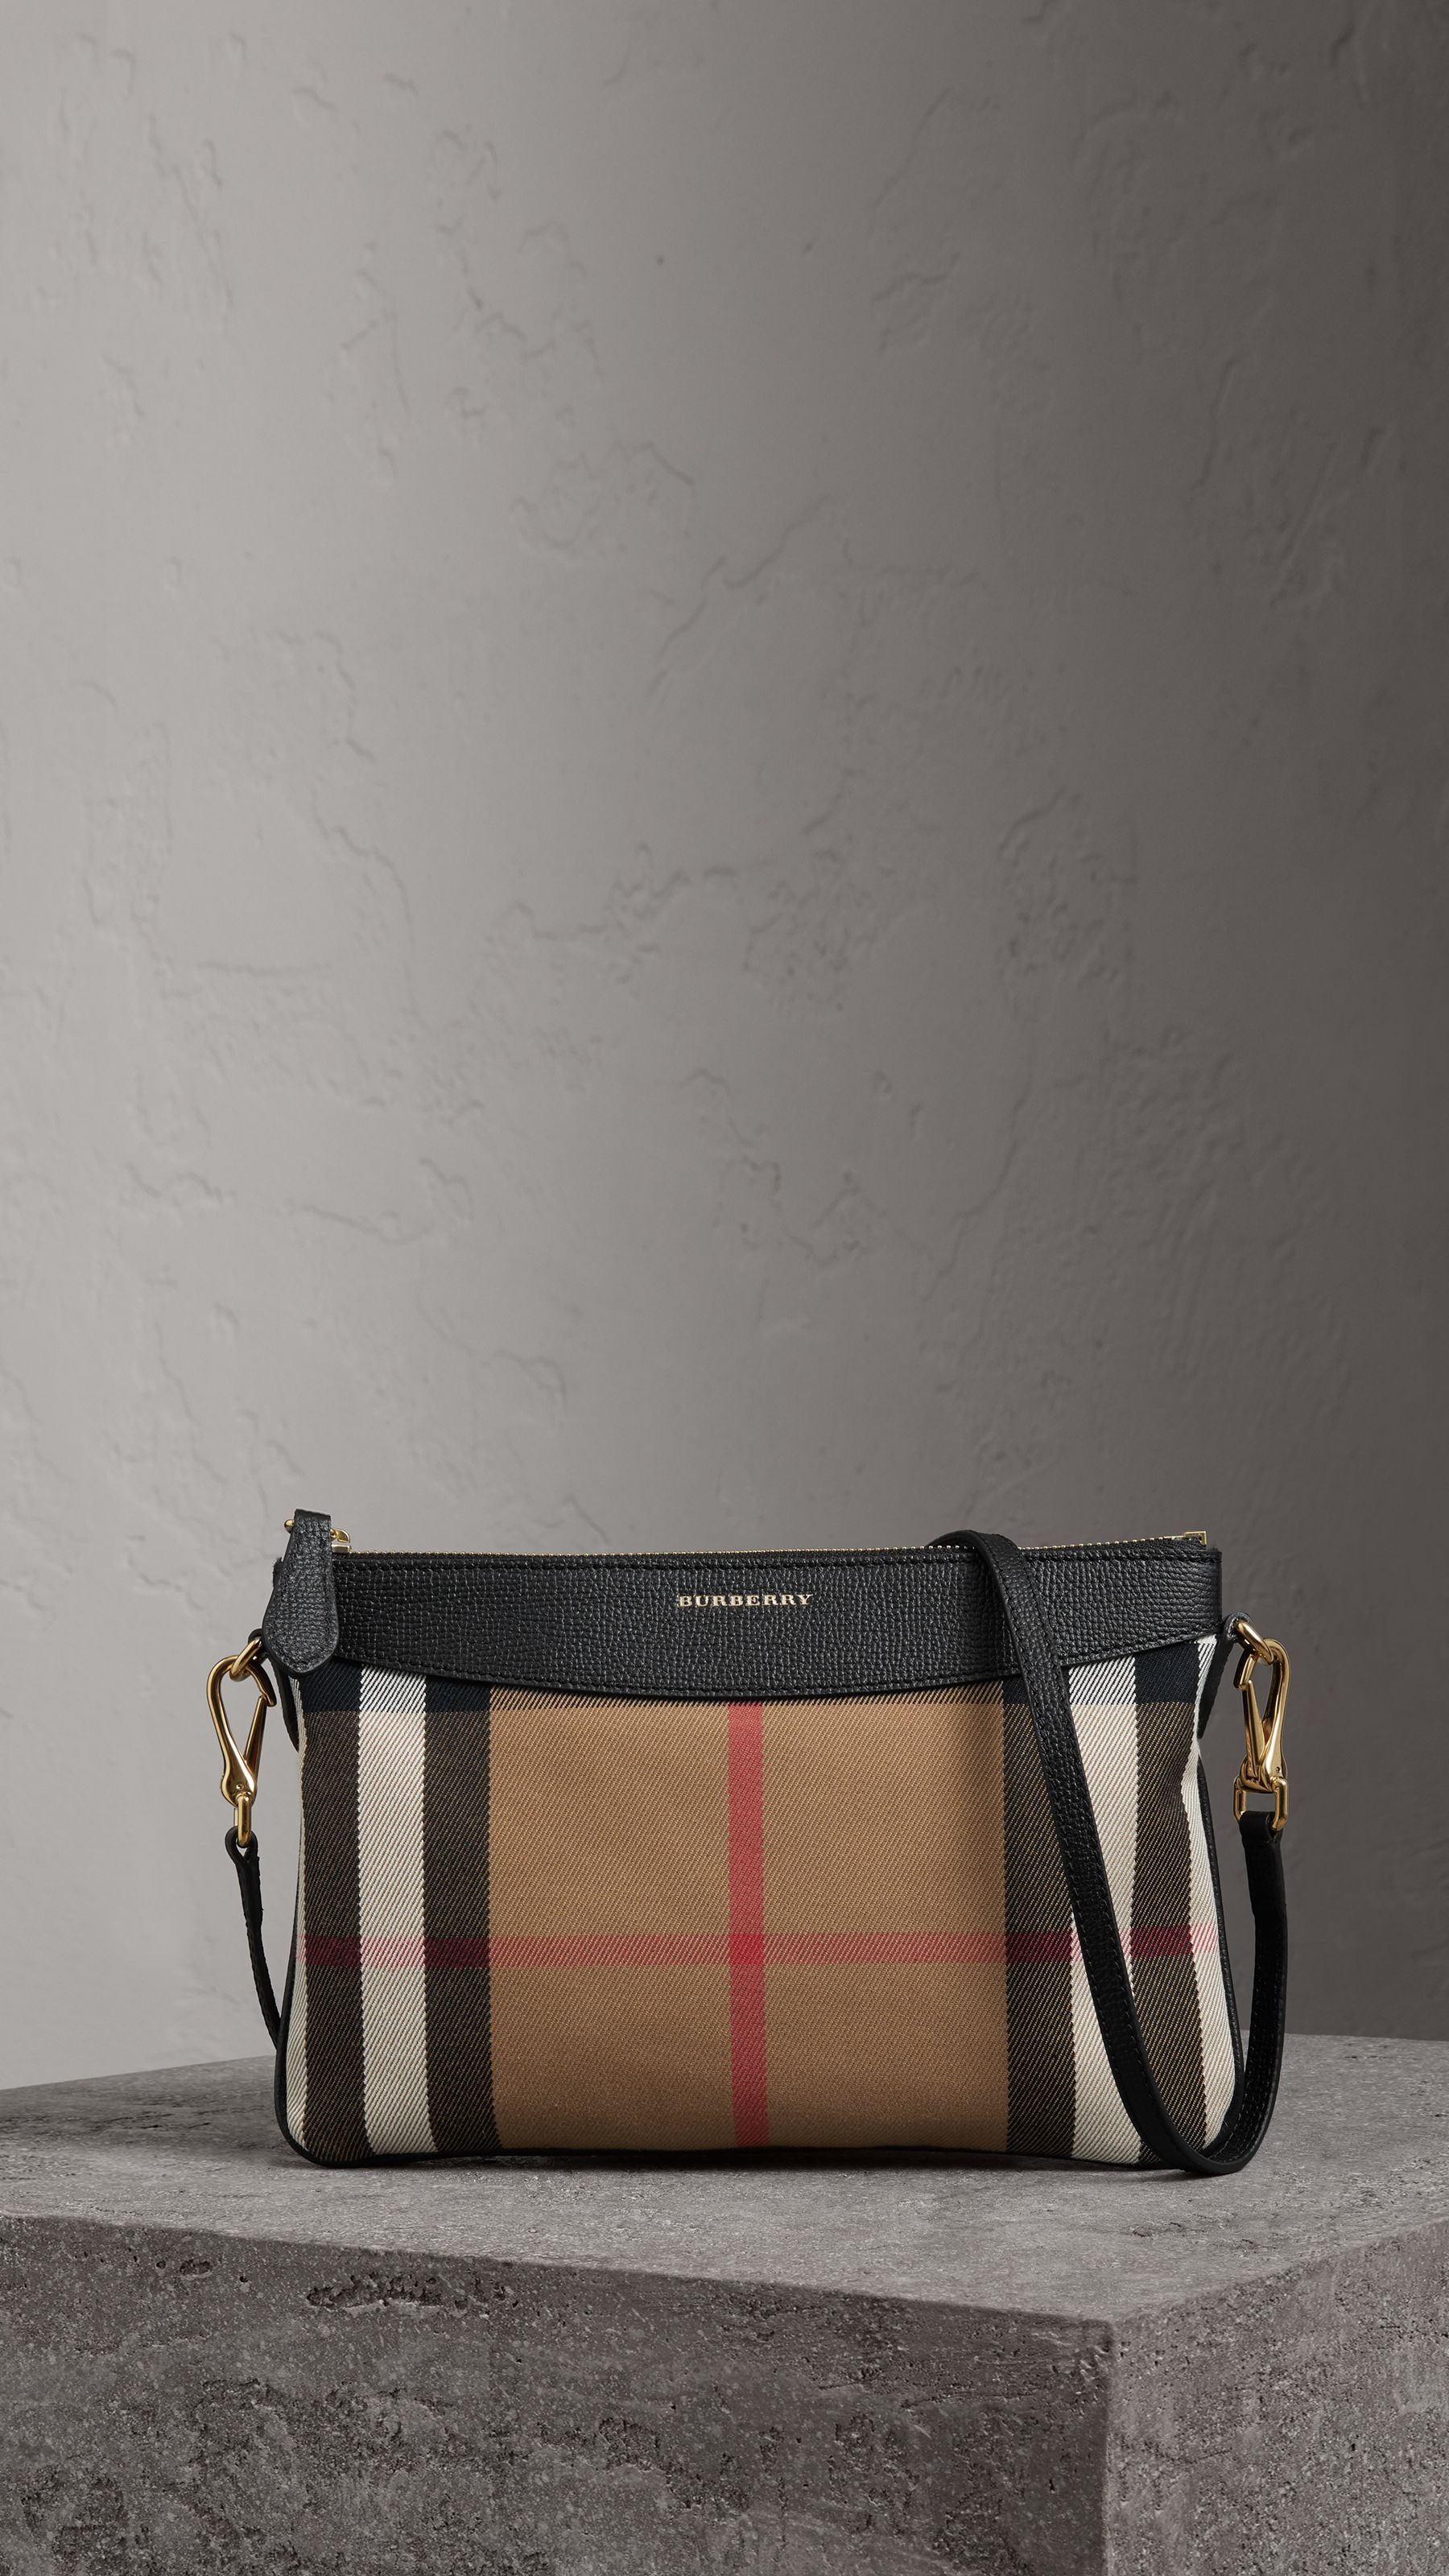 ba926b8dba Women's Crossbody Bags | Burberry | For Me!!! | Bags, Leather clutch ...